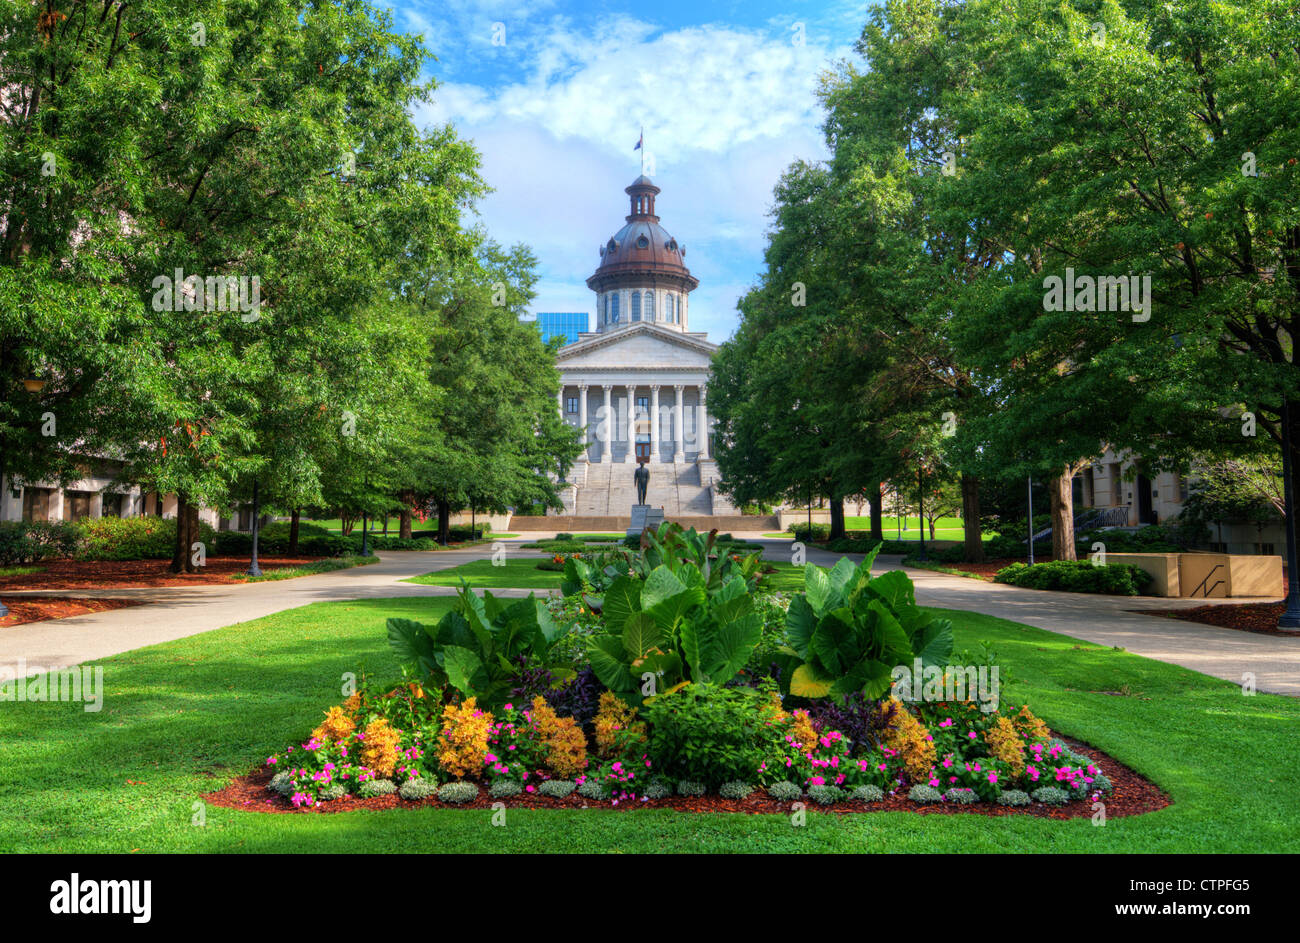 South Carolina State House in Columbia, South Carolina, USA - Stock Image